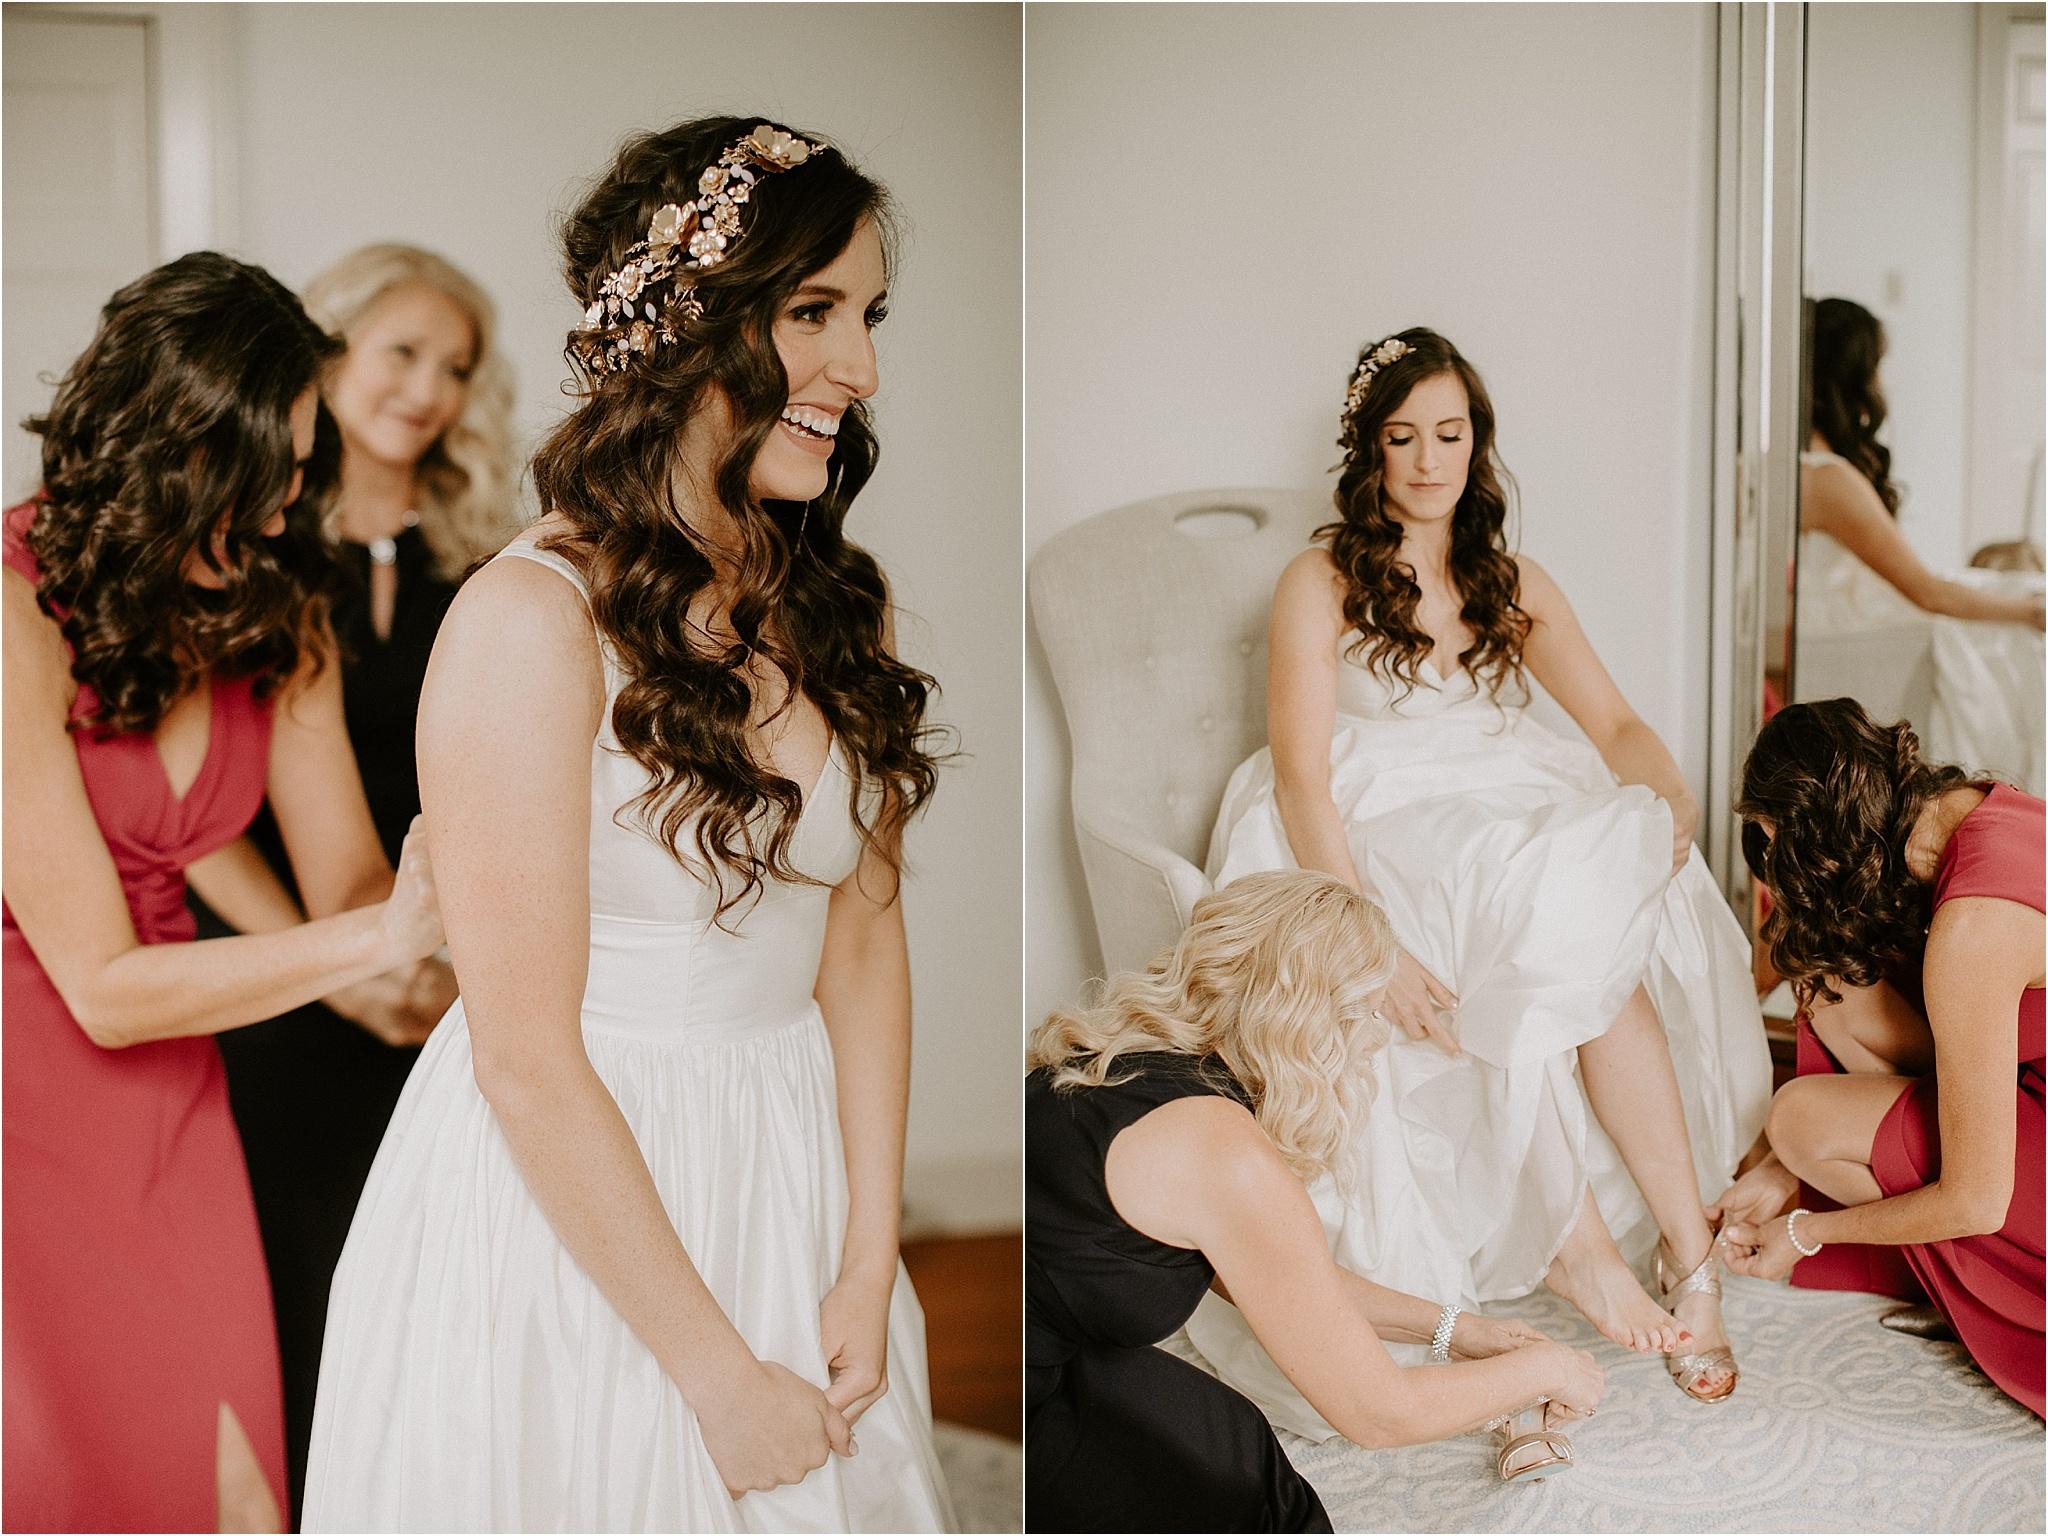 Sarah_Brookhart_Farm_at_Eagles_Ridge_Wedding_Photographer_0009.jpg